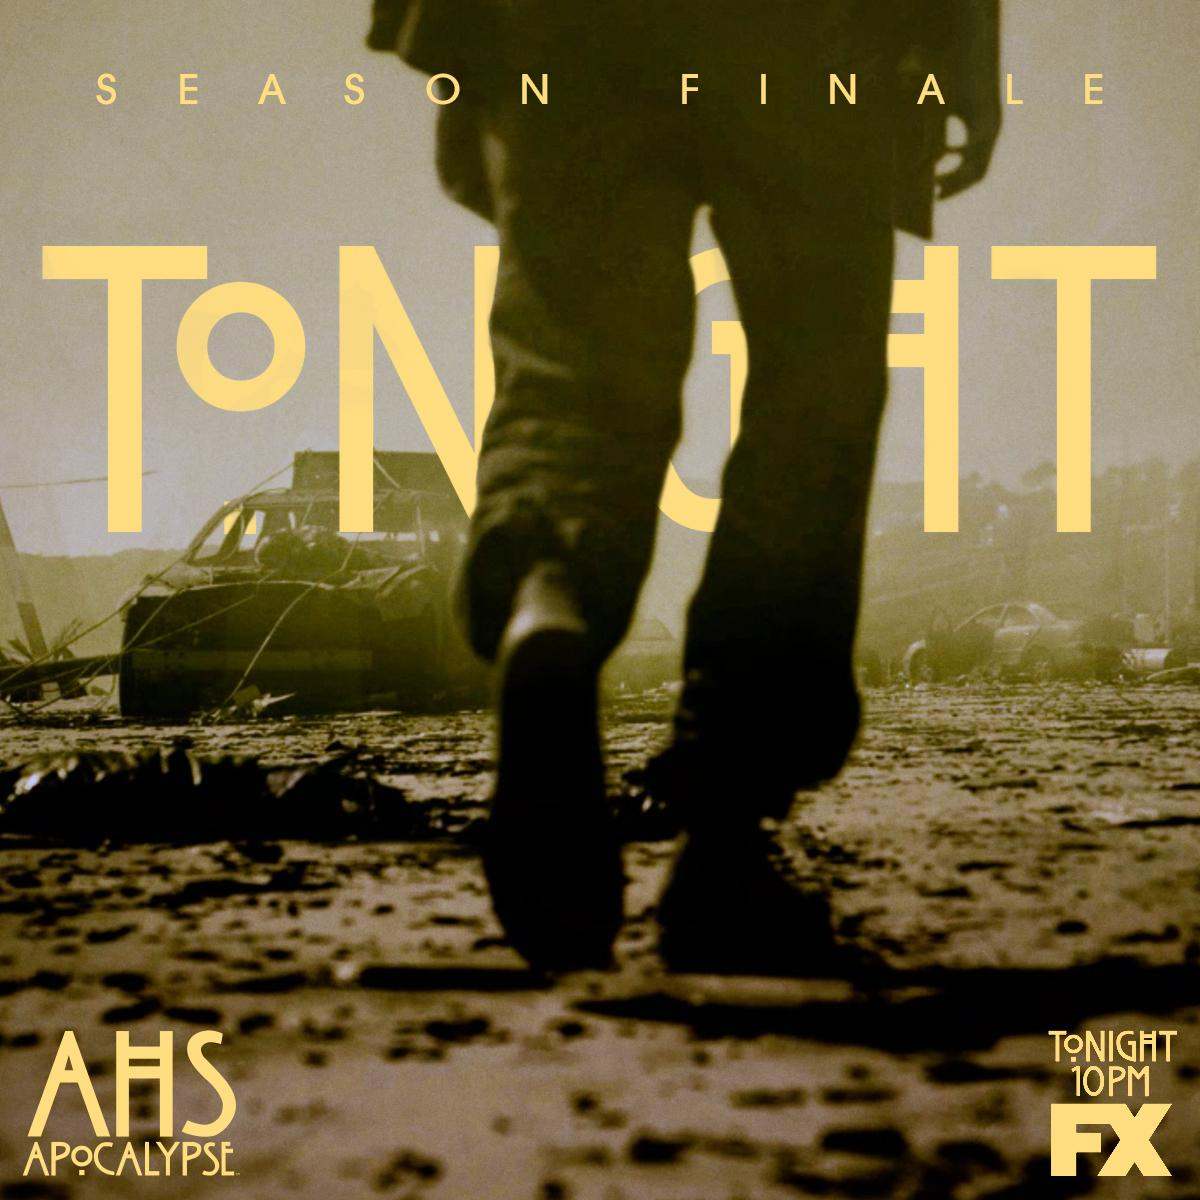 It ends tonight... #AHSApocalypse